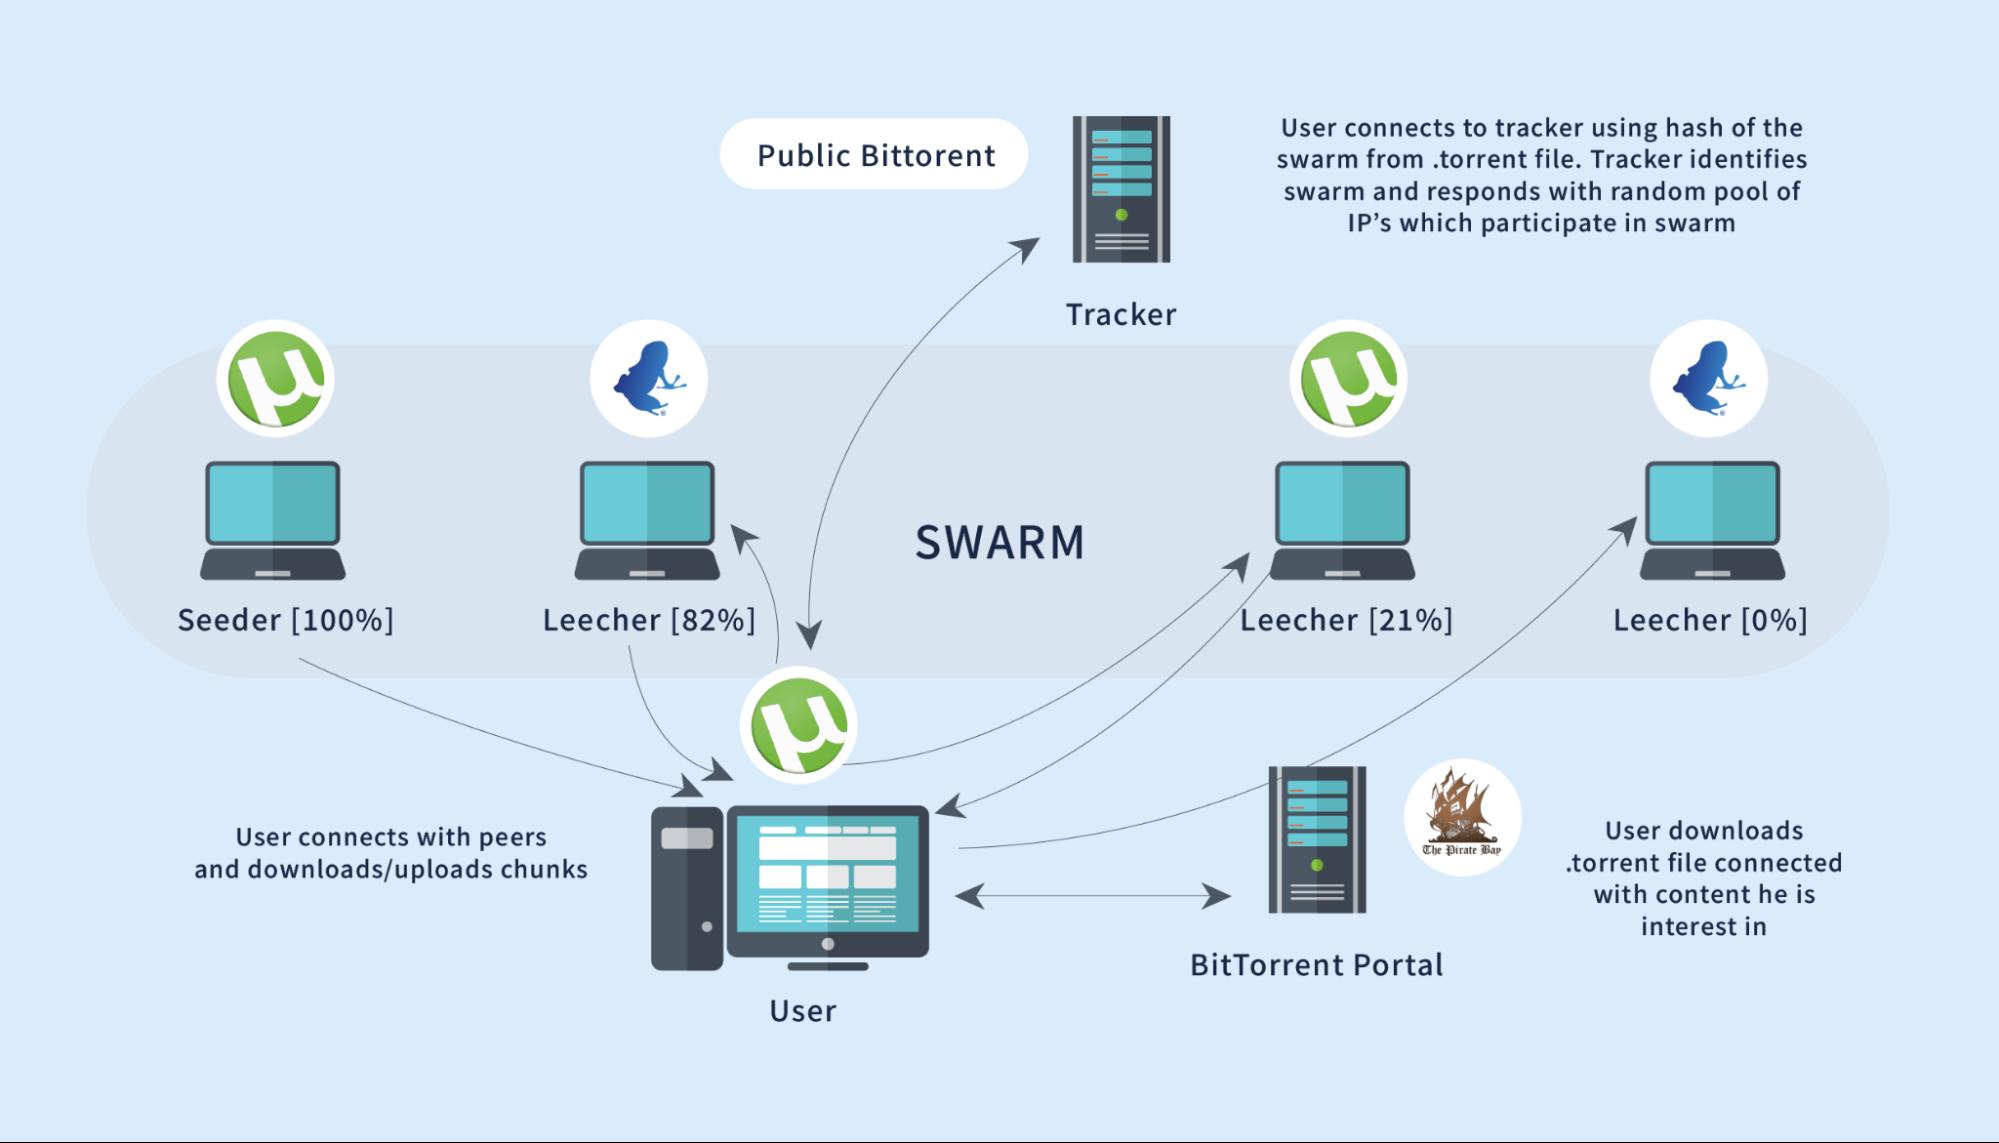 IP address in torrent swarm